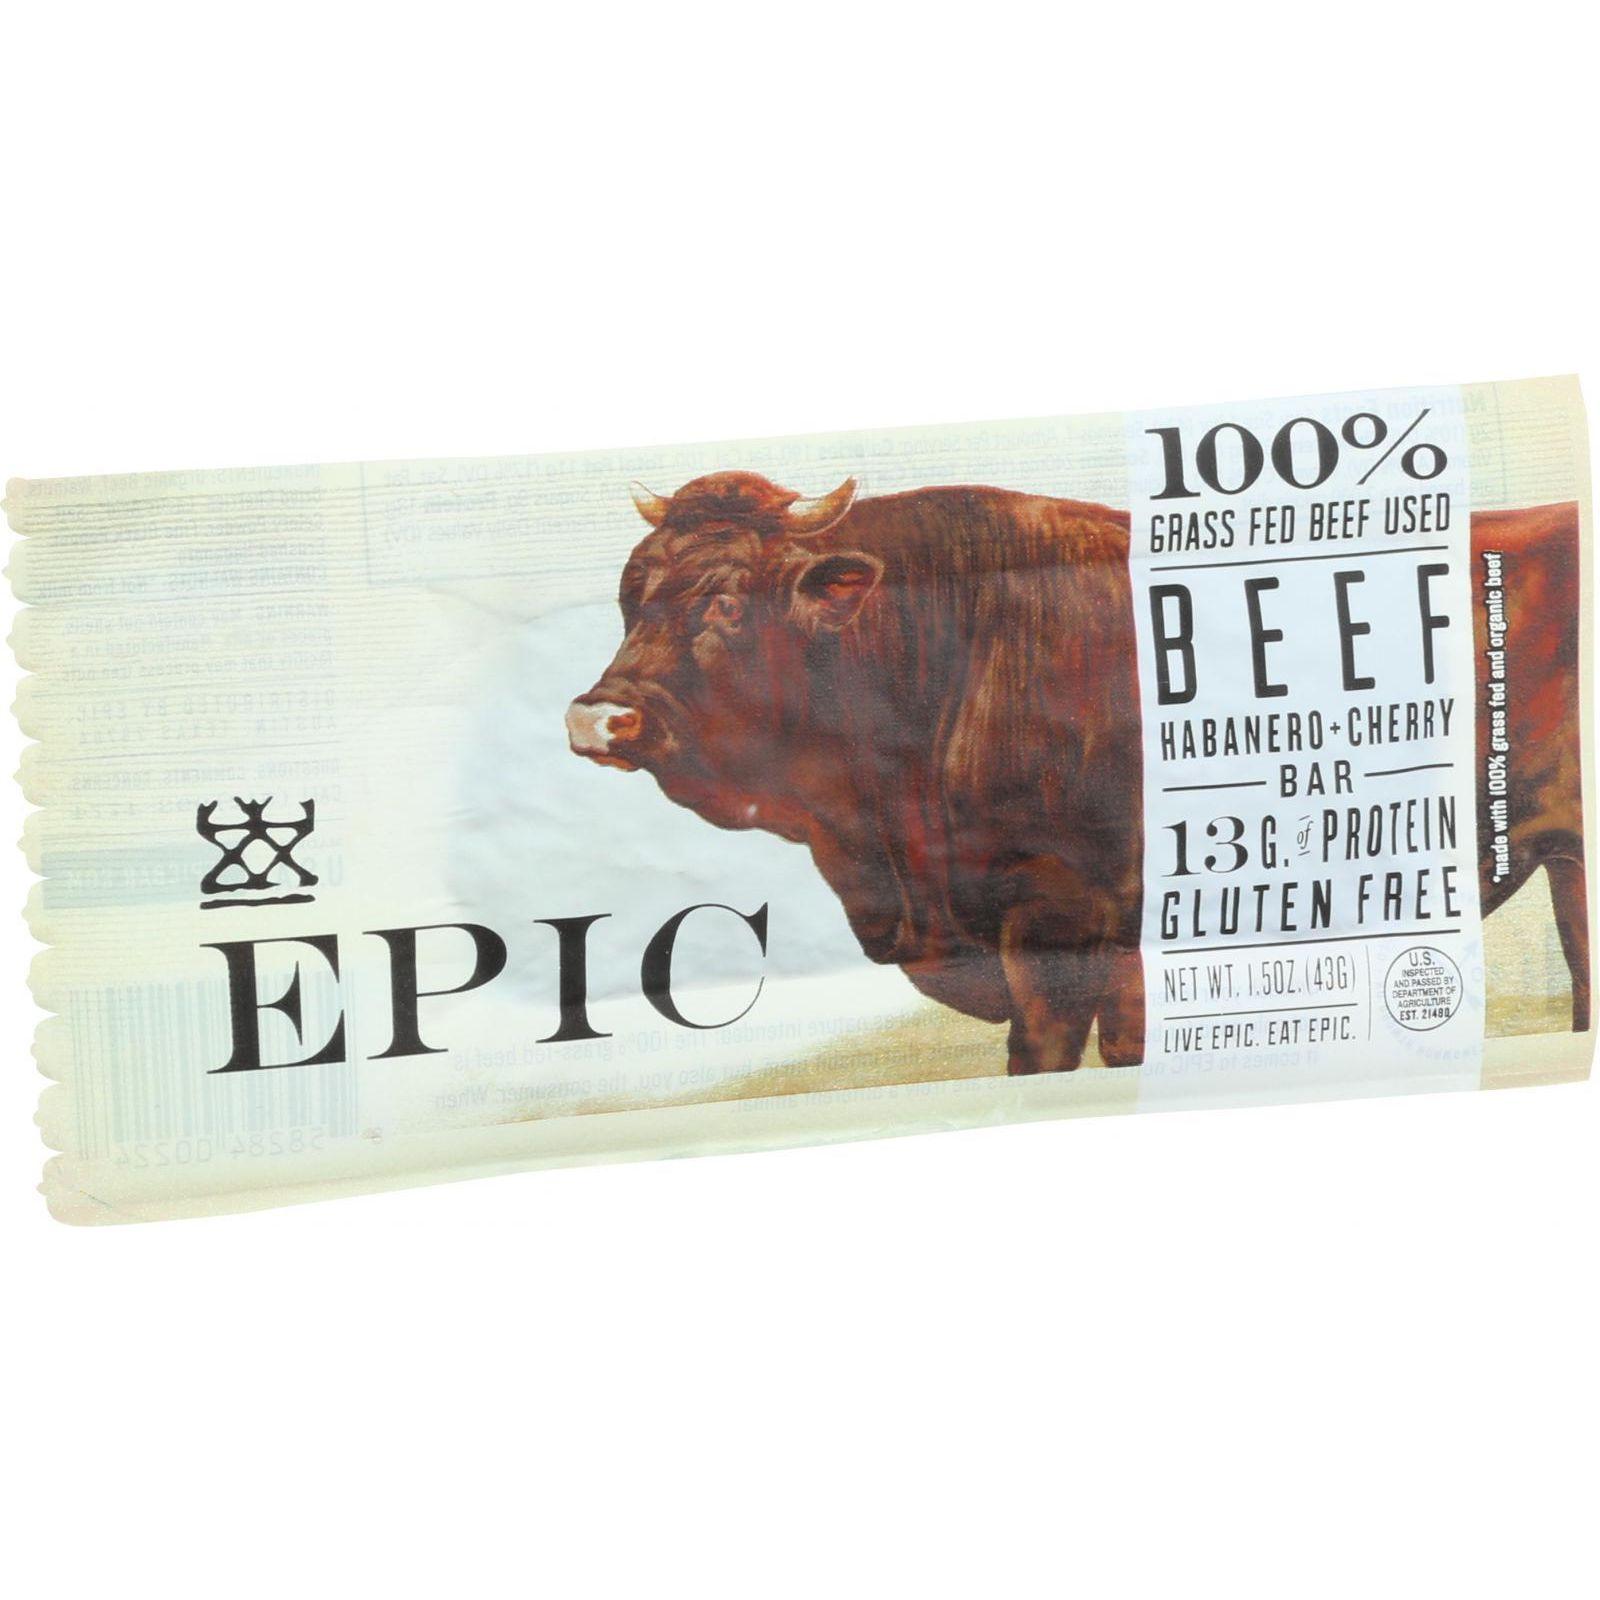 Epic Bar - Beef Habanero Cherry - 1.5 Oz Bars - Case Of 12